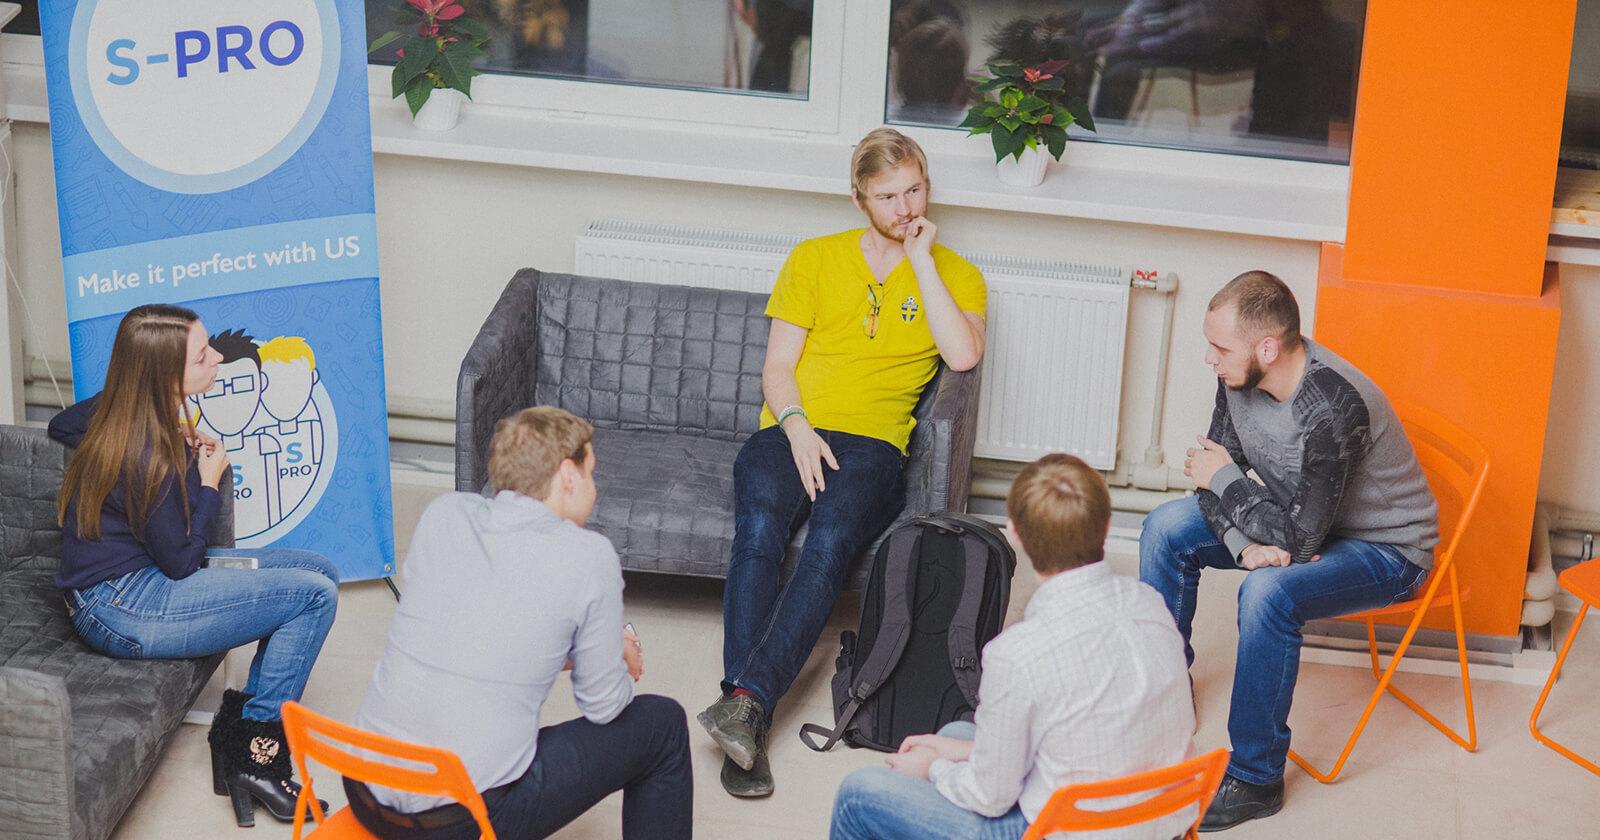 Startup Idea Matrix - Blog S-PRO